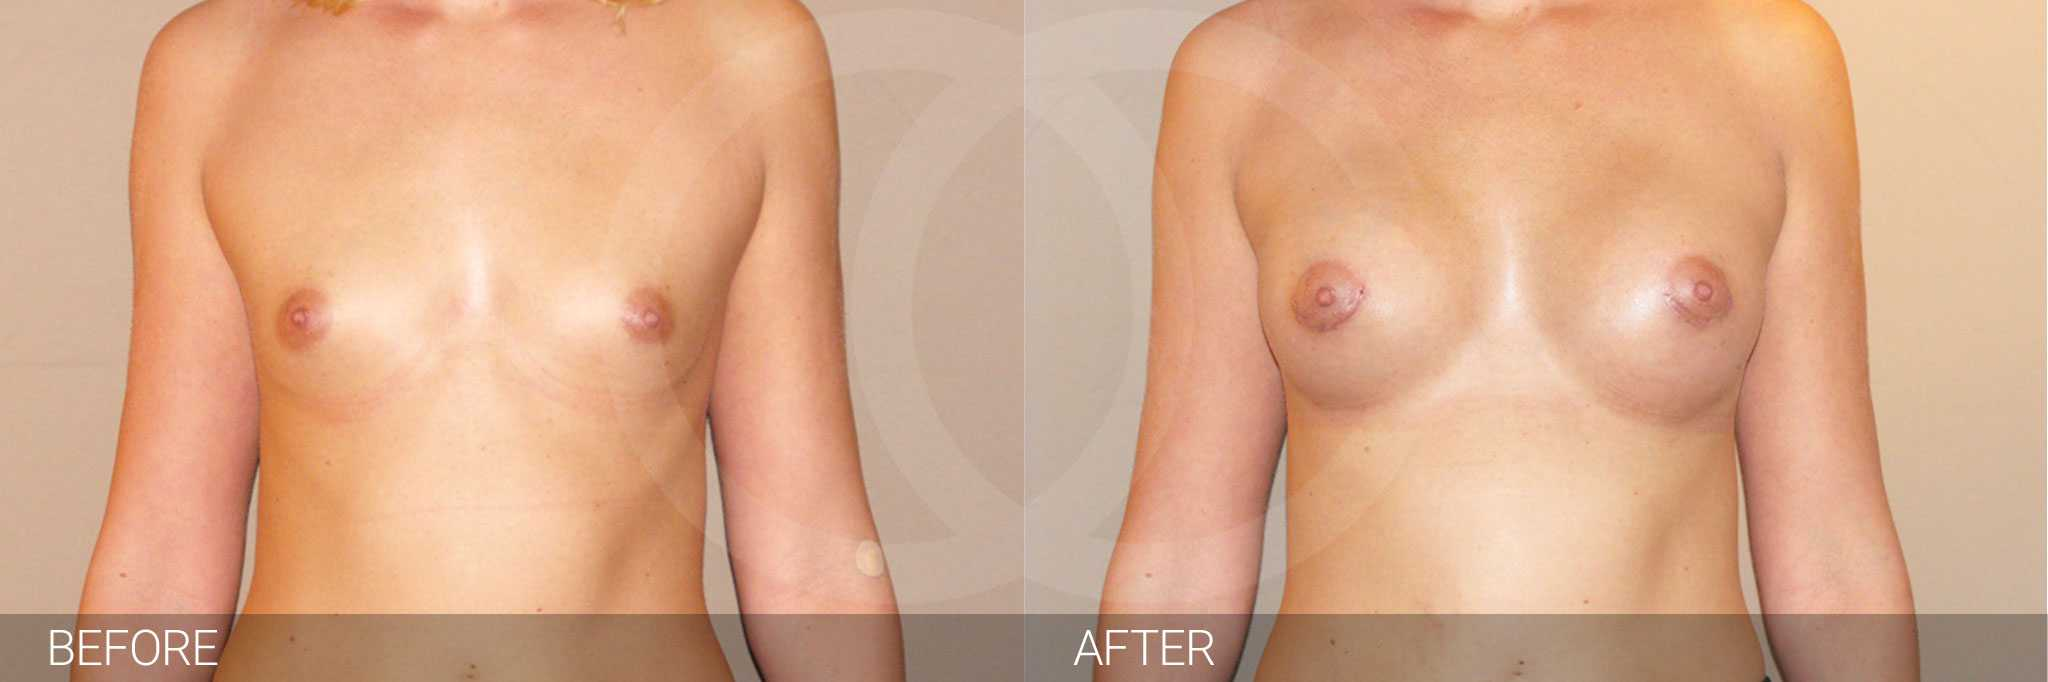 Augmentation mammaire Prothèse en silicone ante/post-op I